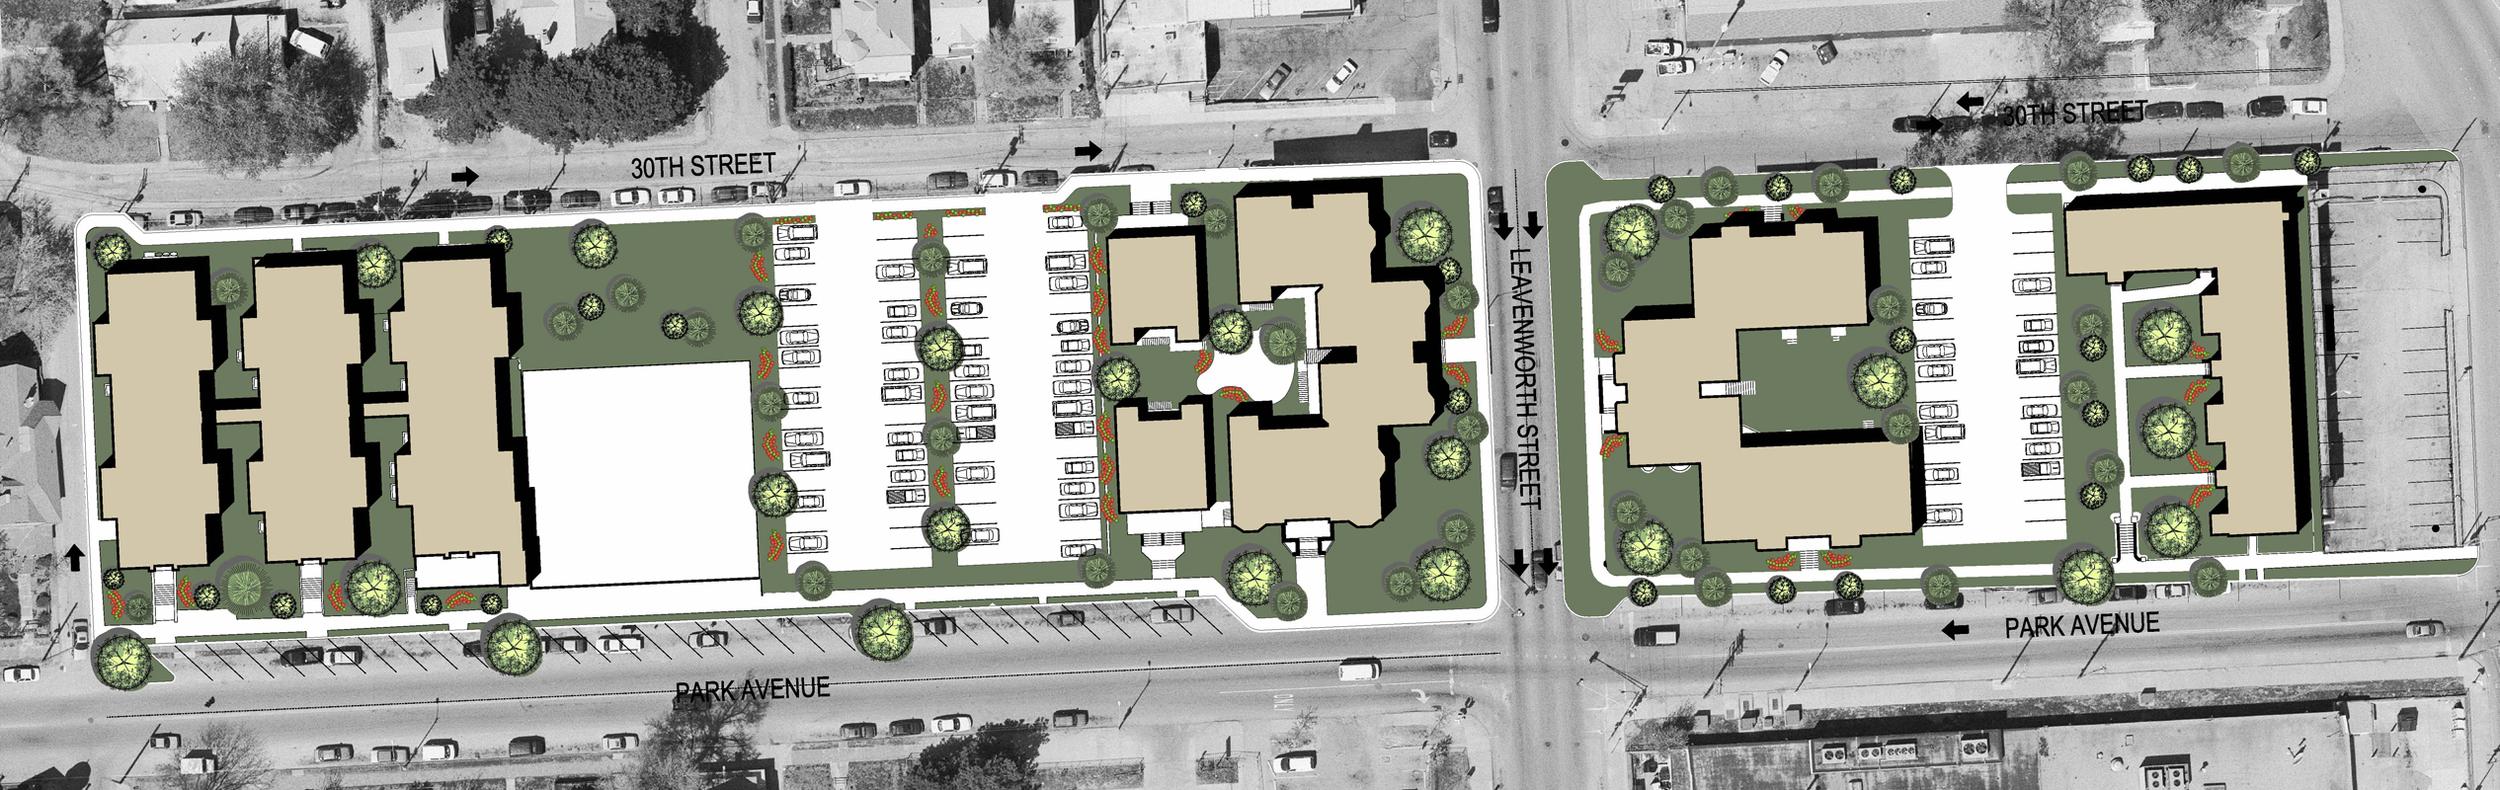 Park Ave Master Plan Presentation.jpg